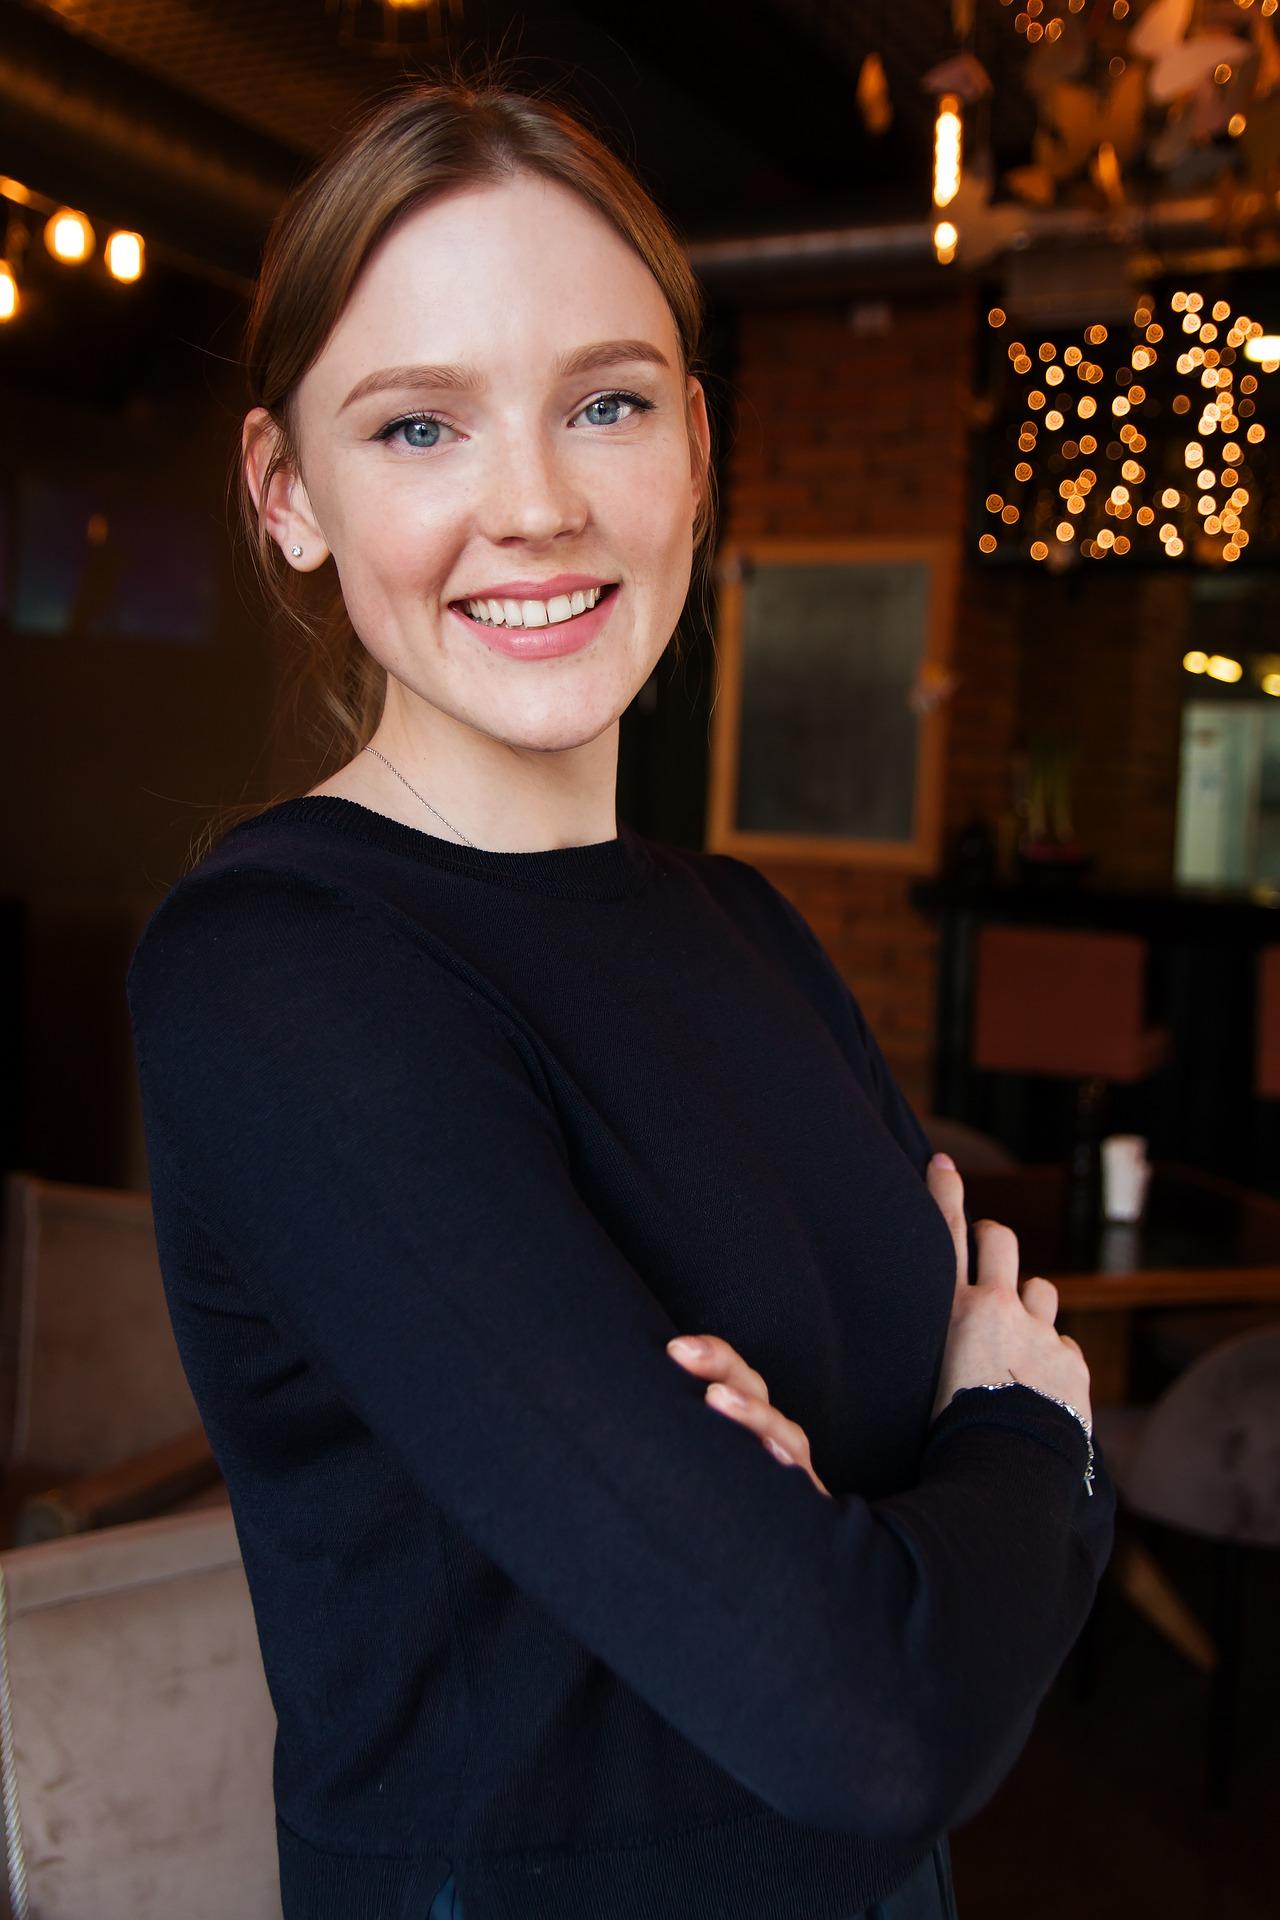 Carola Schwarz